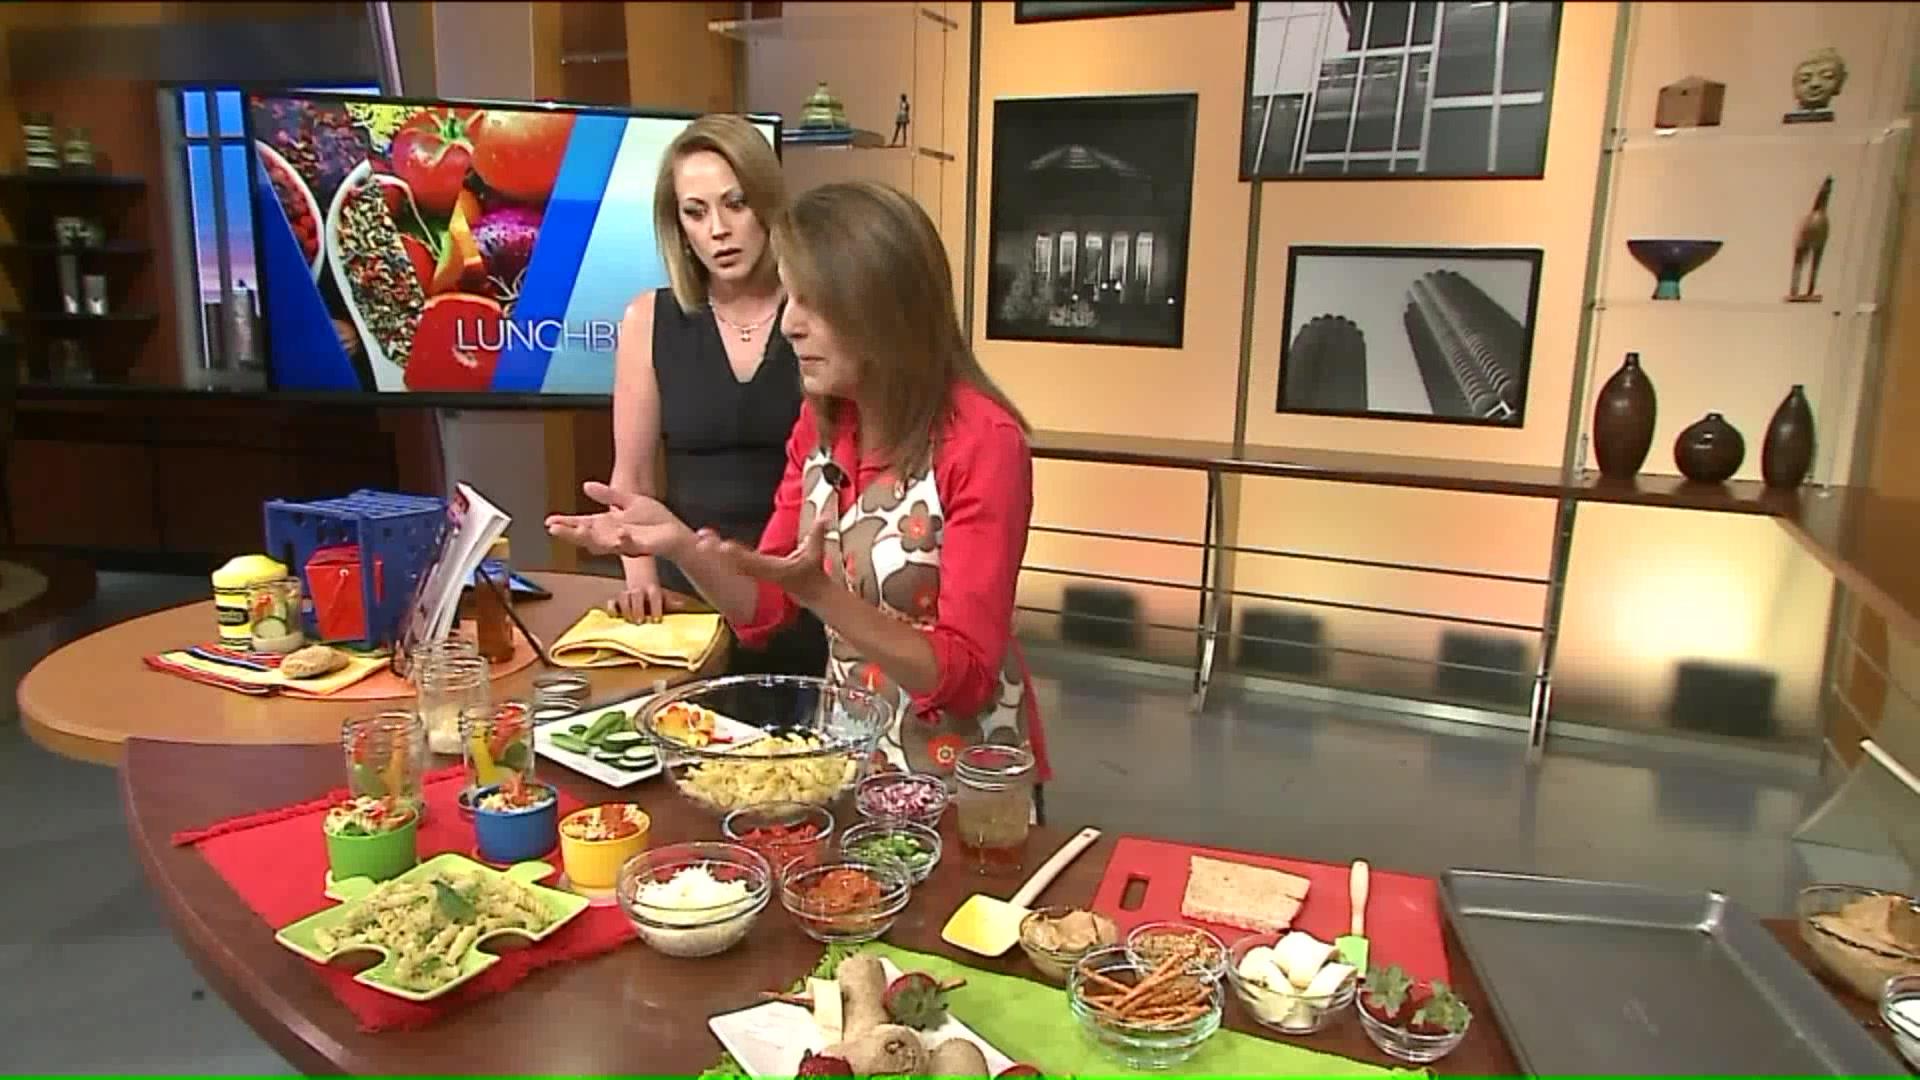 4 Fun Back-to-School Lunch Ideas